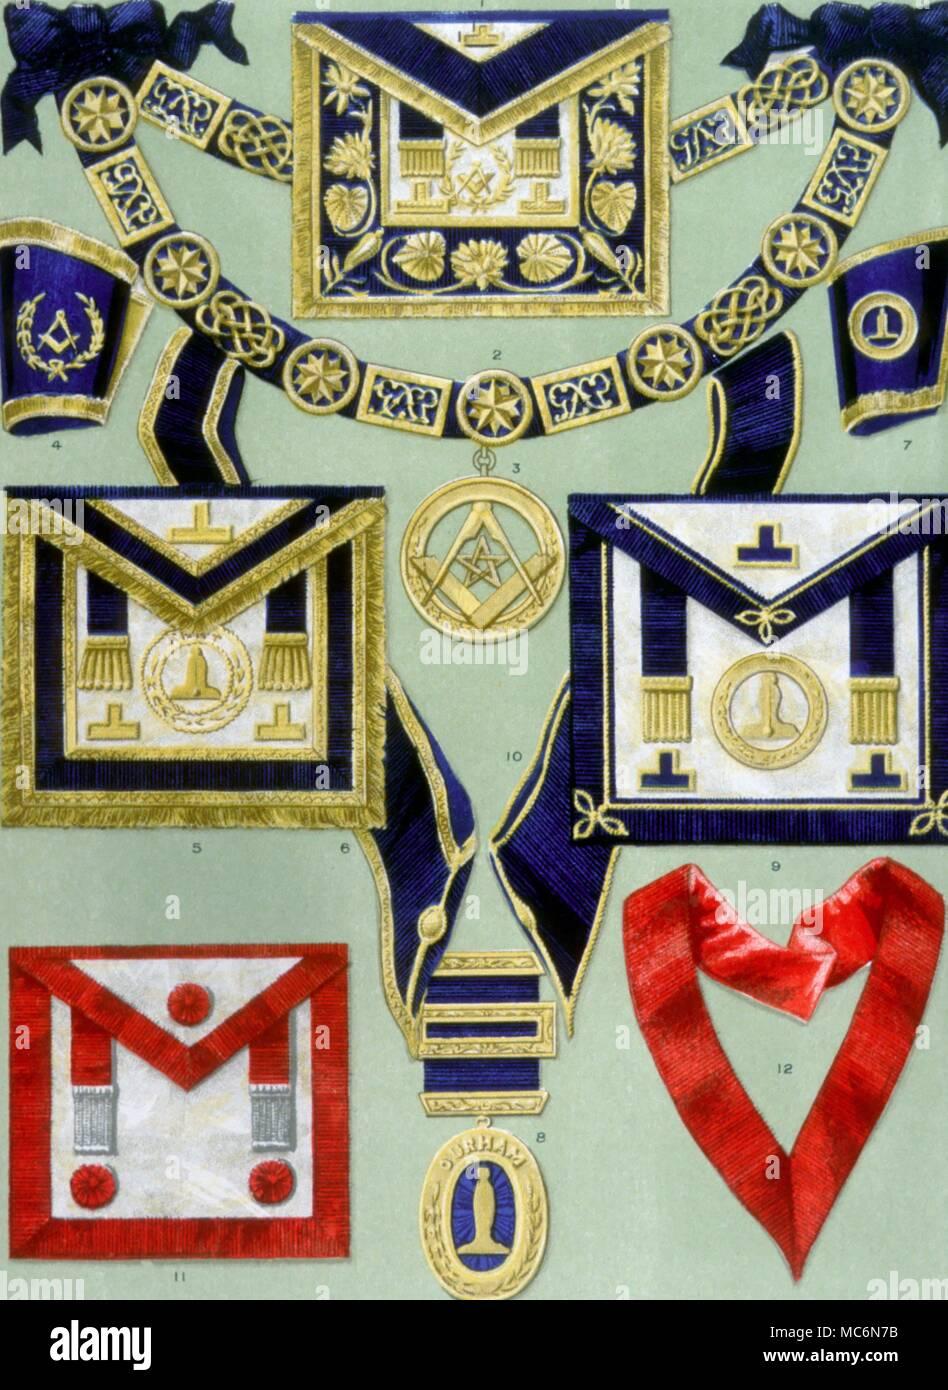 Masonic Ritual Stock Photos & Masonic Ritual Stock Images